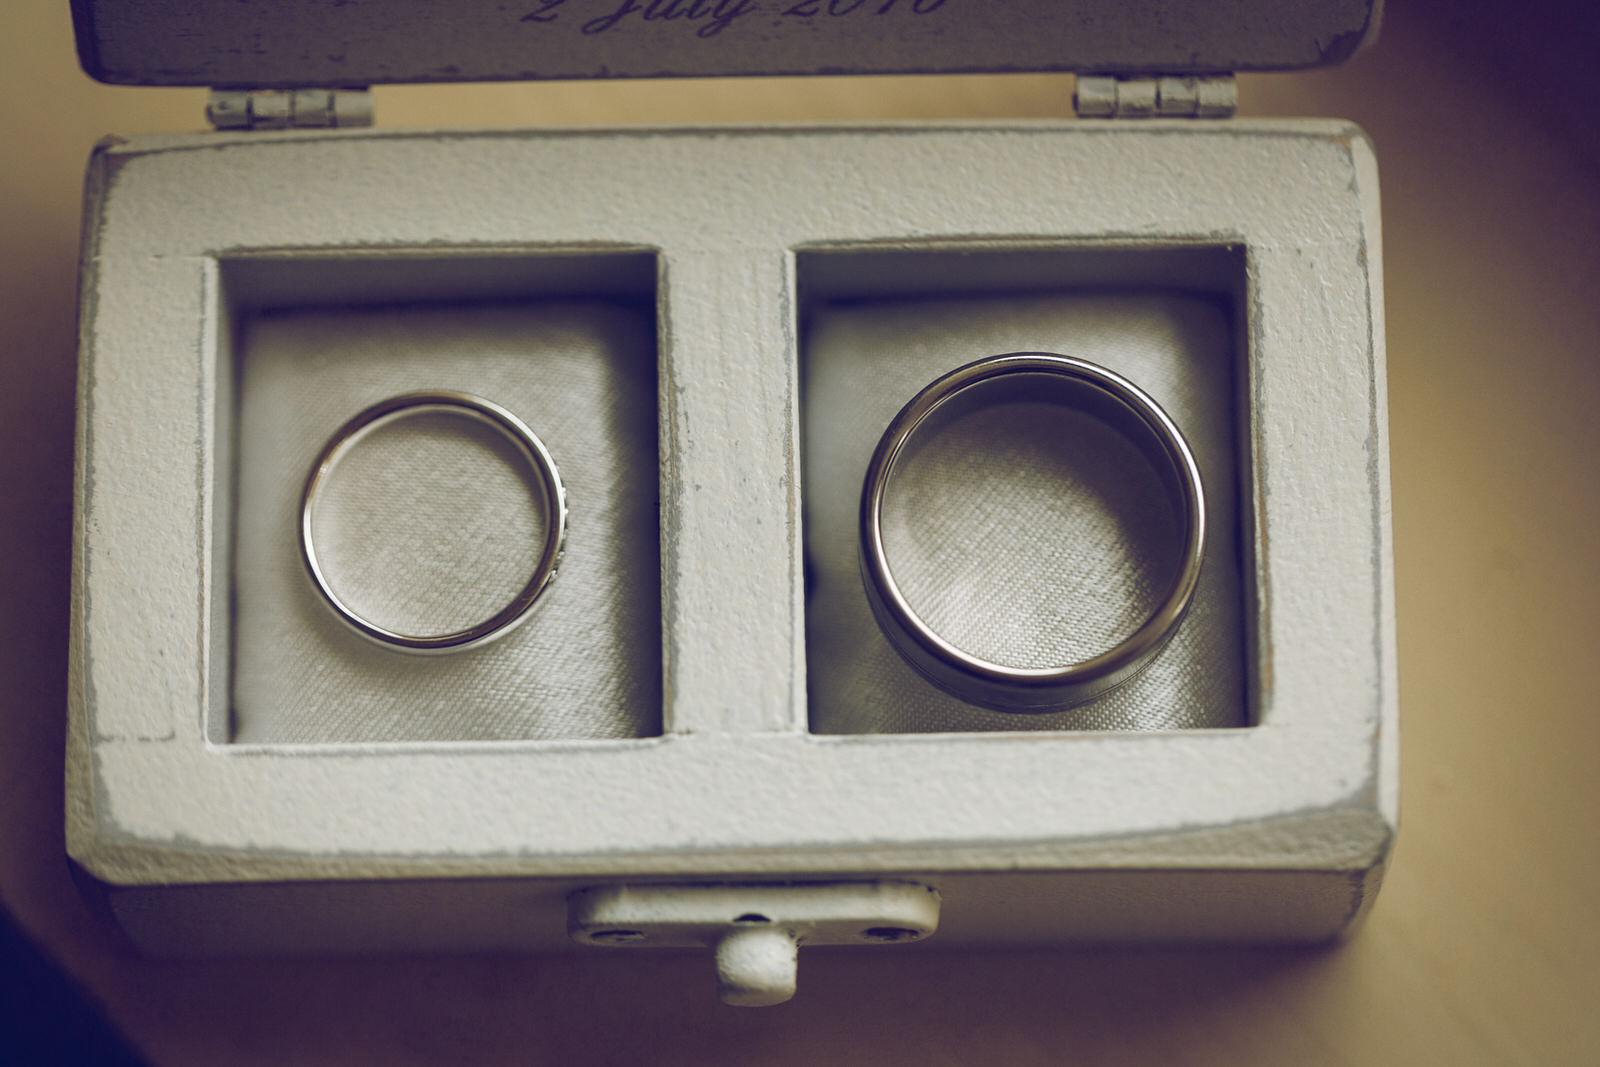 Brooklodge-wicklow-wedding-photographer_005.jpg